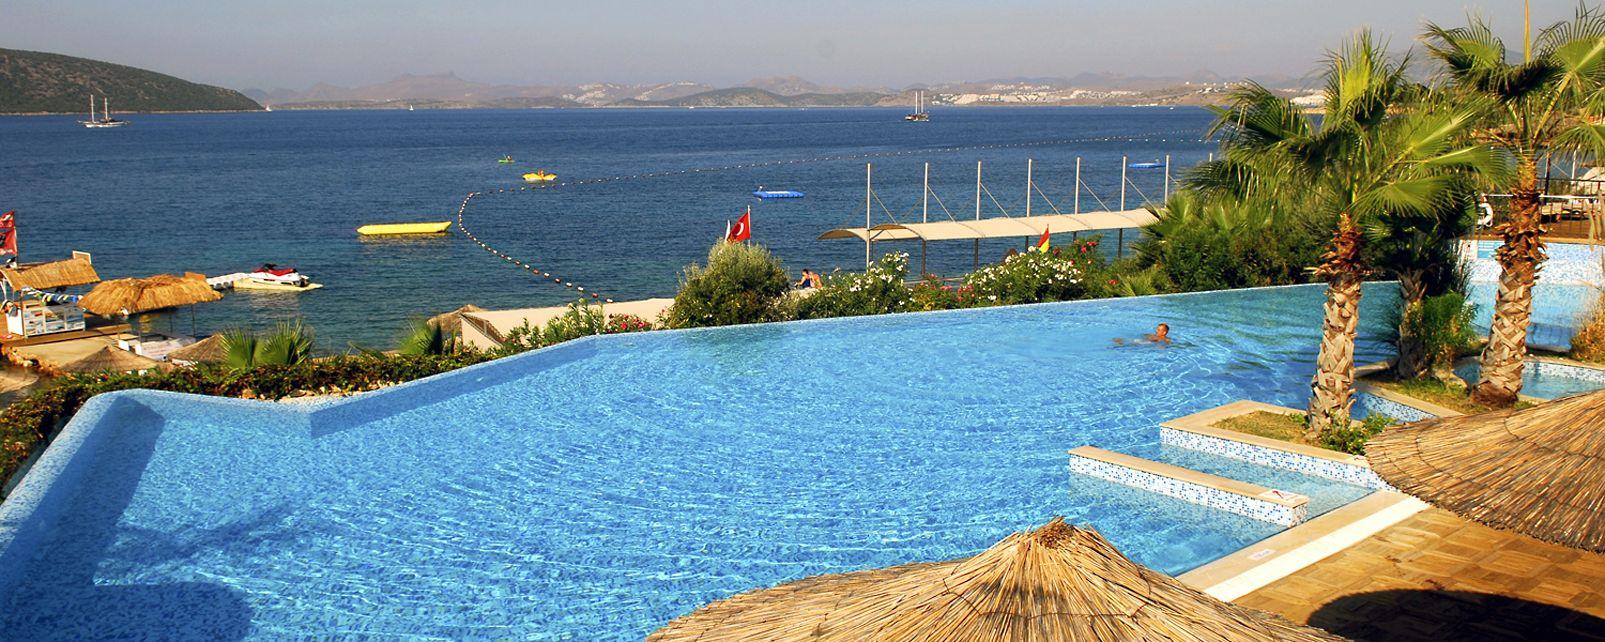 Ersan Resort And Spa Hotel